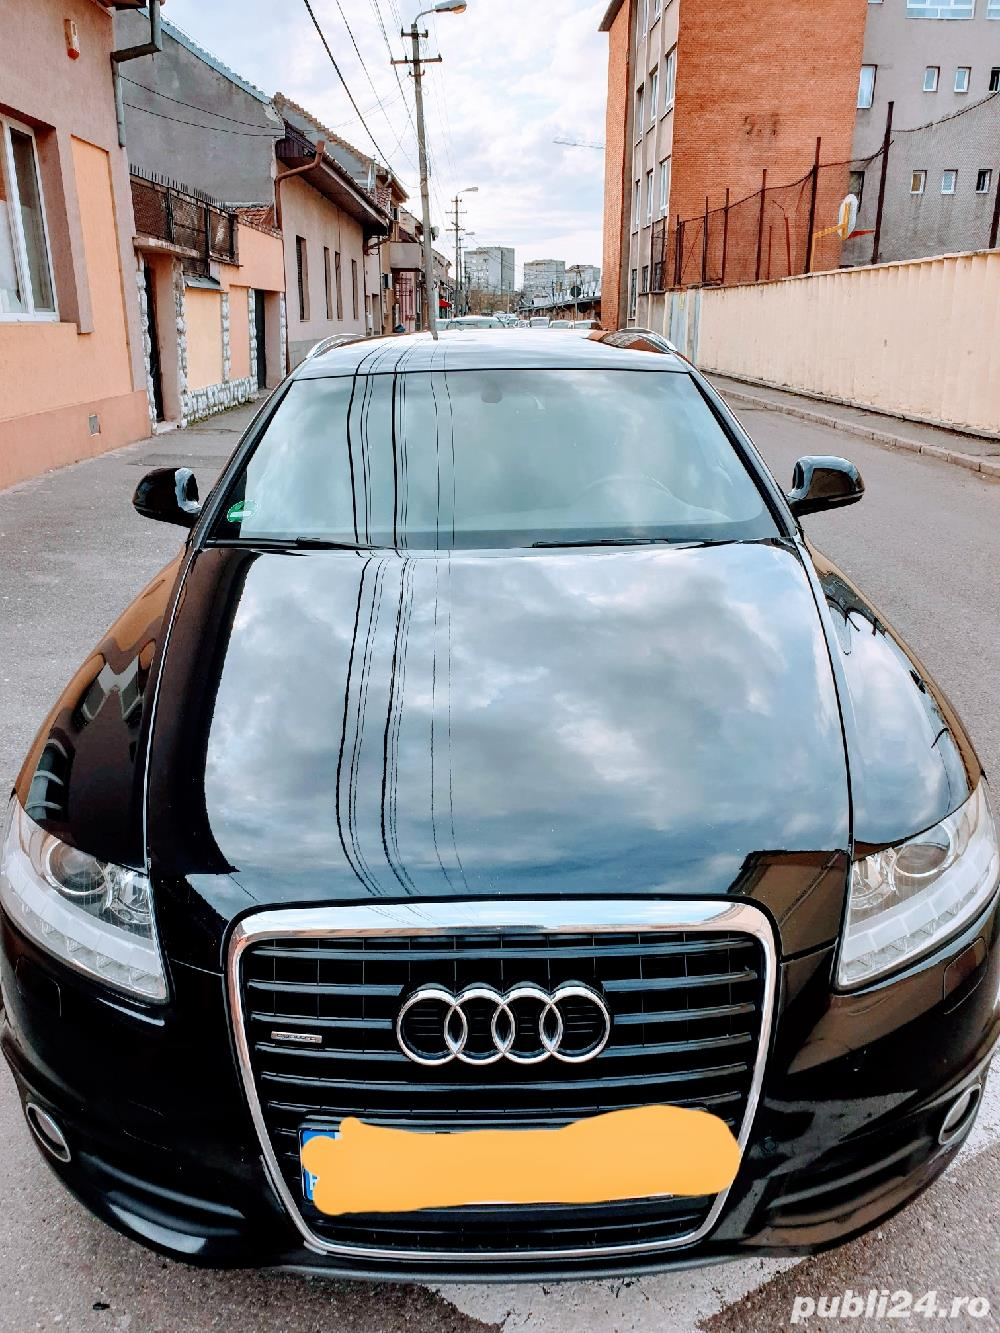 Audi A6 quattro/Sline/2.7tdi/190cp